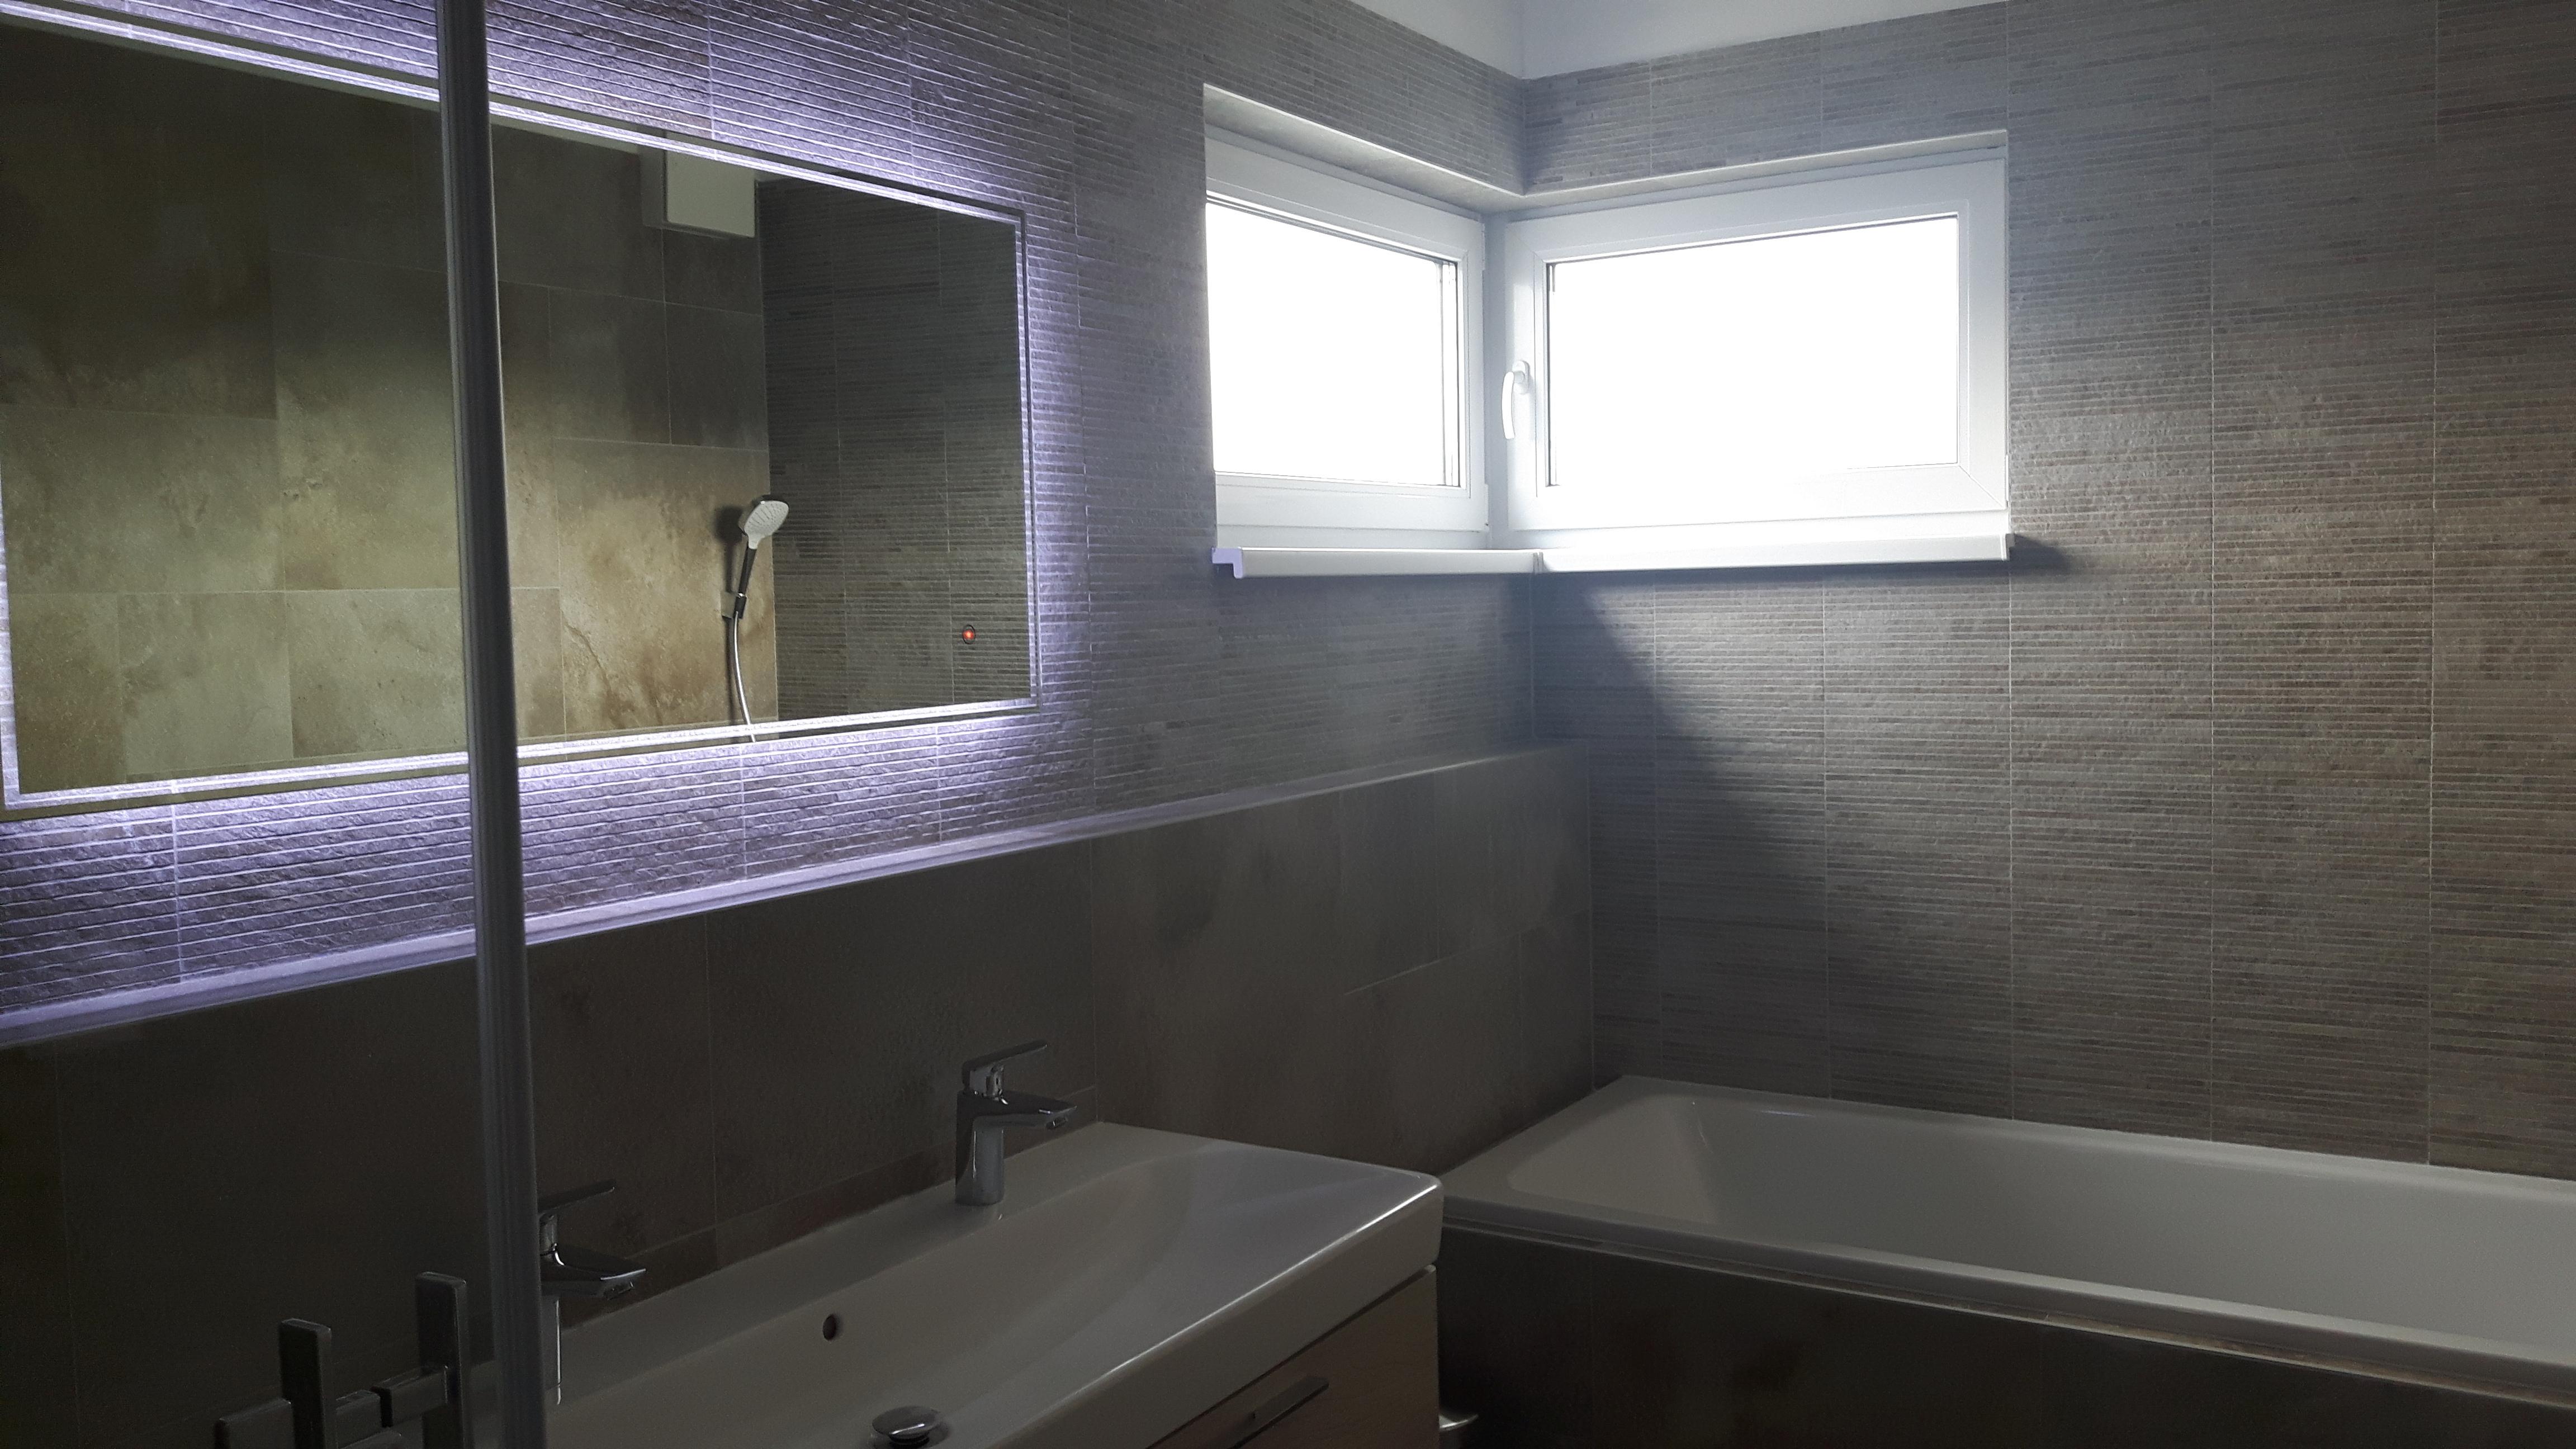 Twilight zrkadlo s led osvetlením